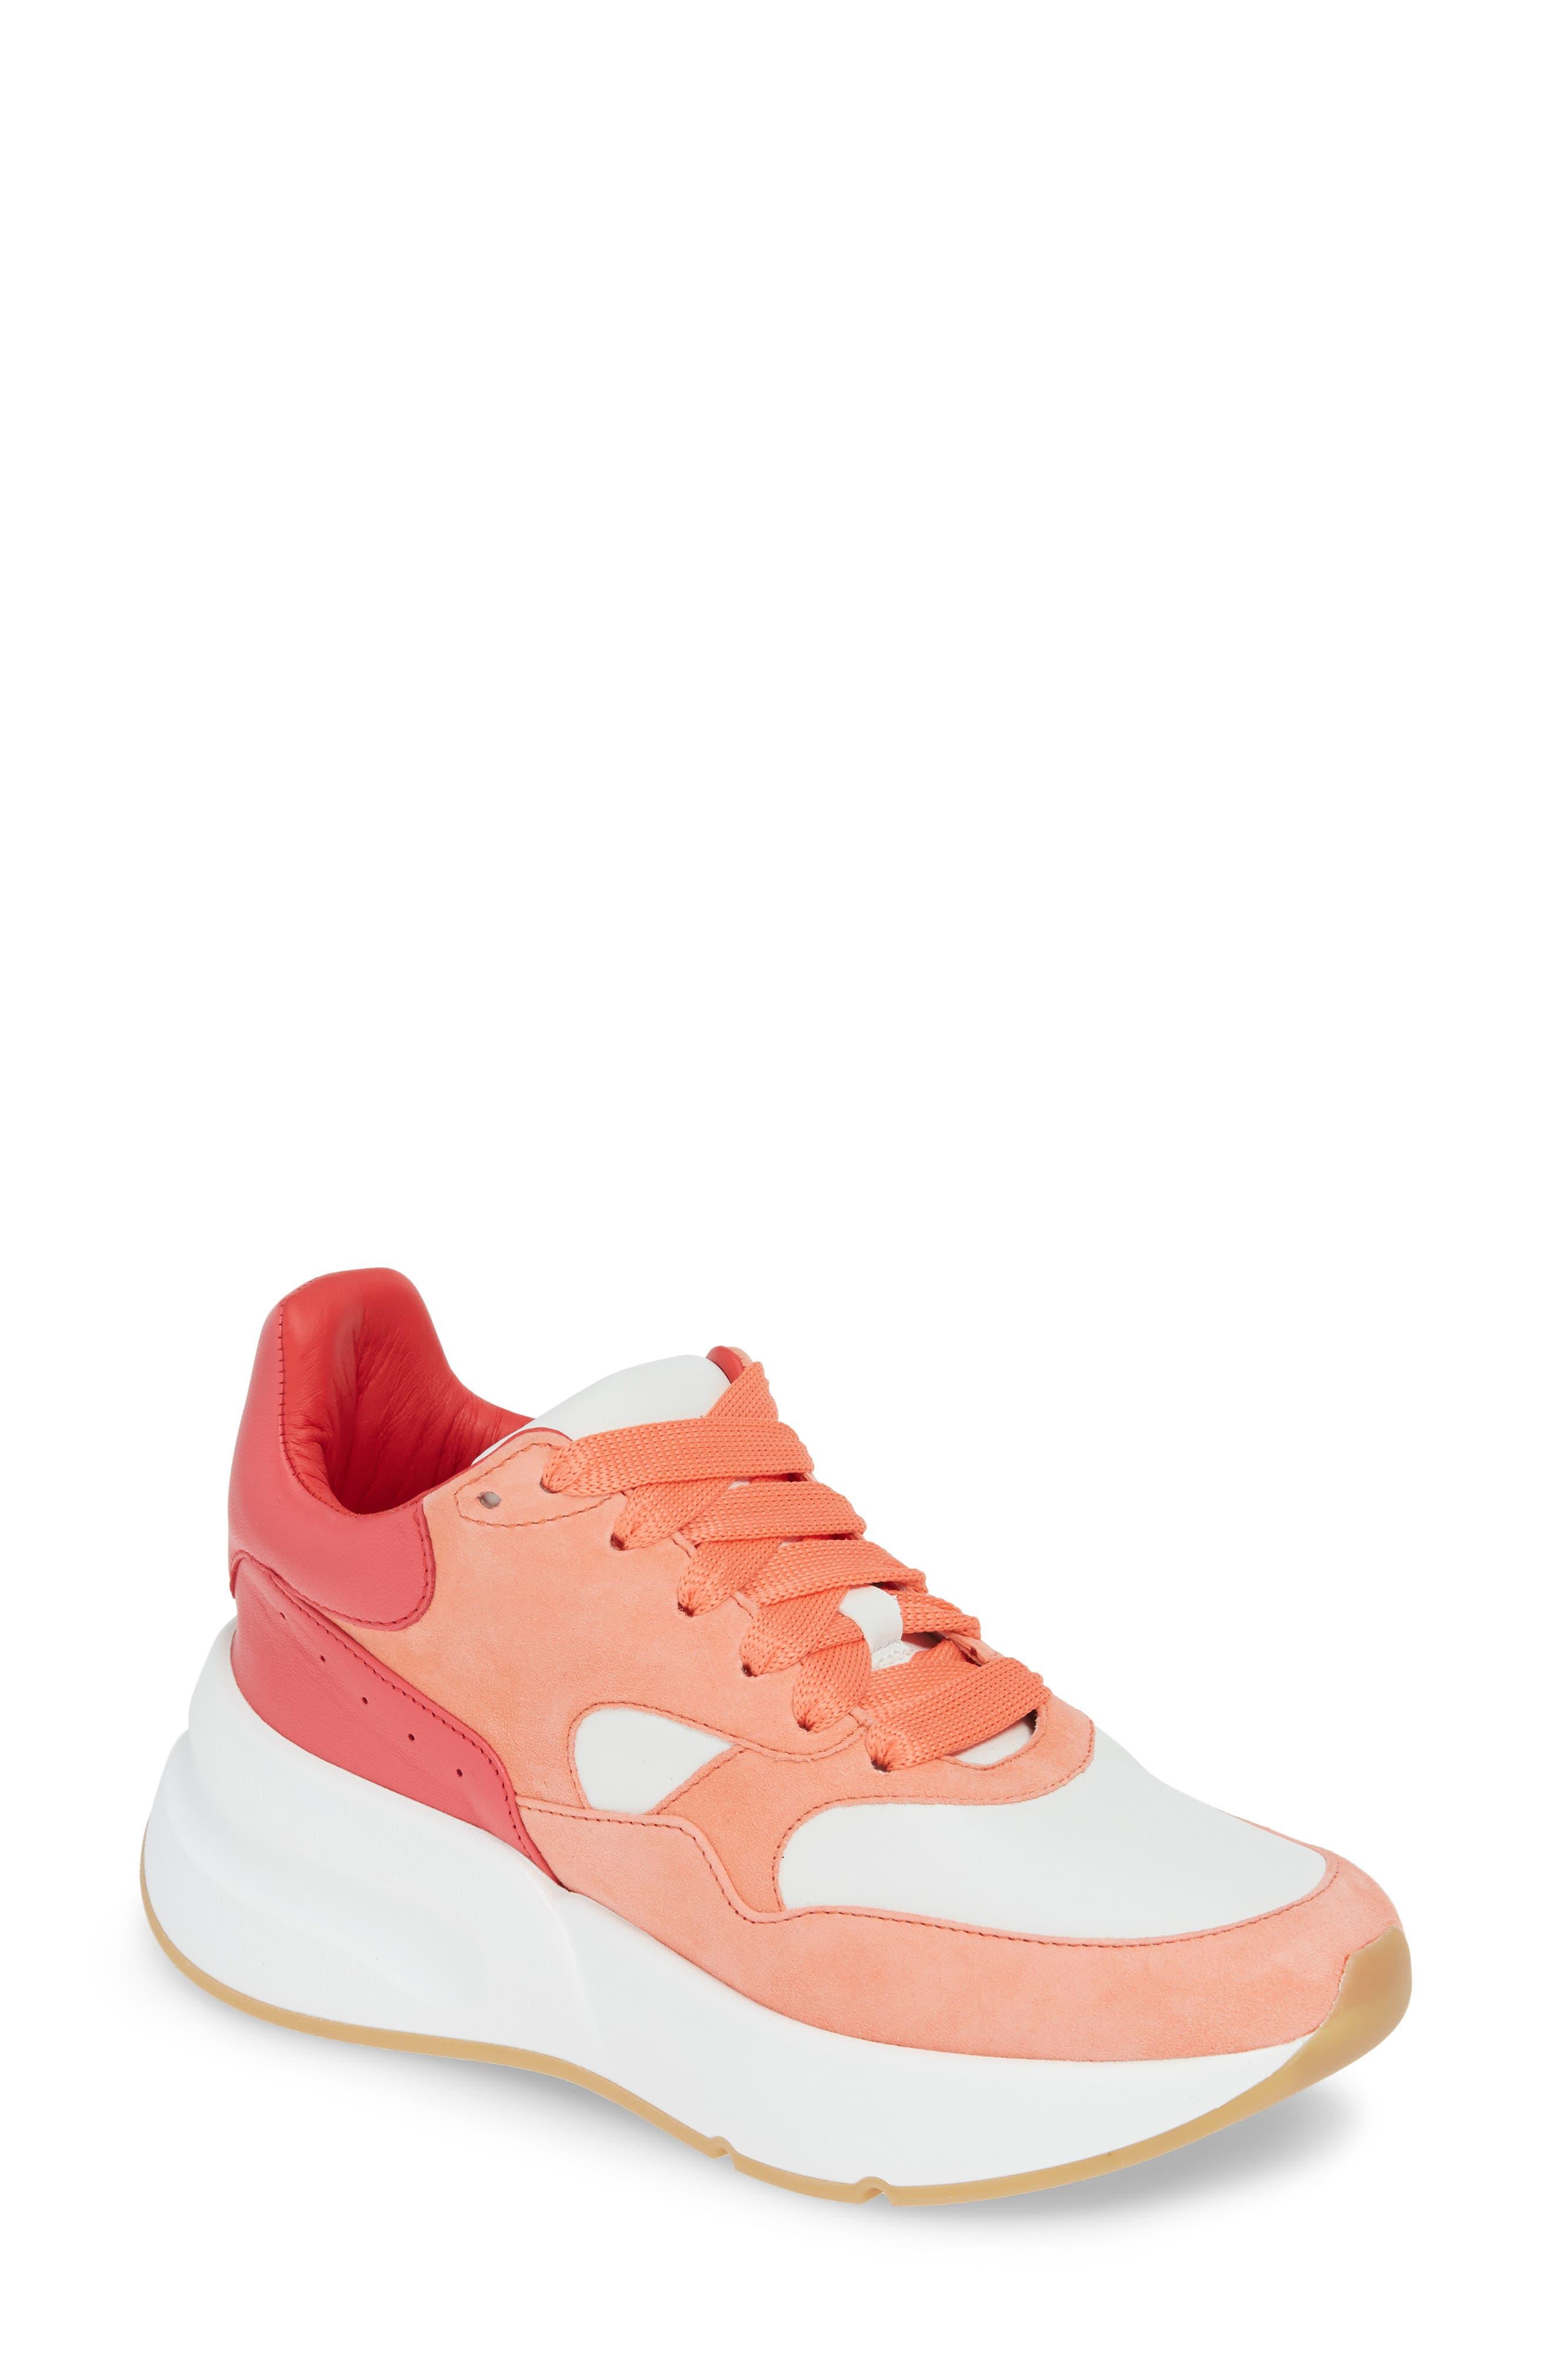 a1d3957a8 Alexander Mcqueen Lace-Up Platform Sneaker - Coral